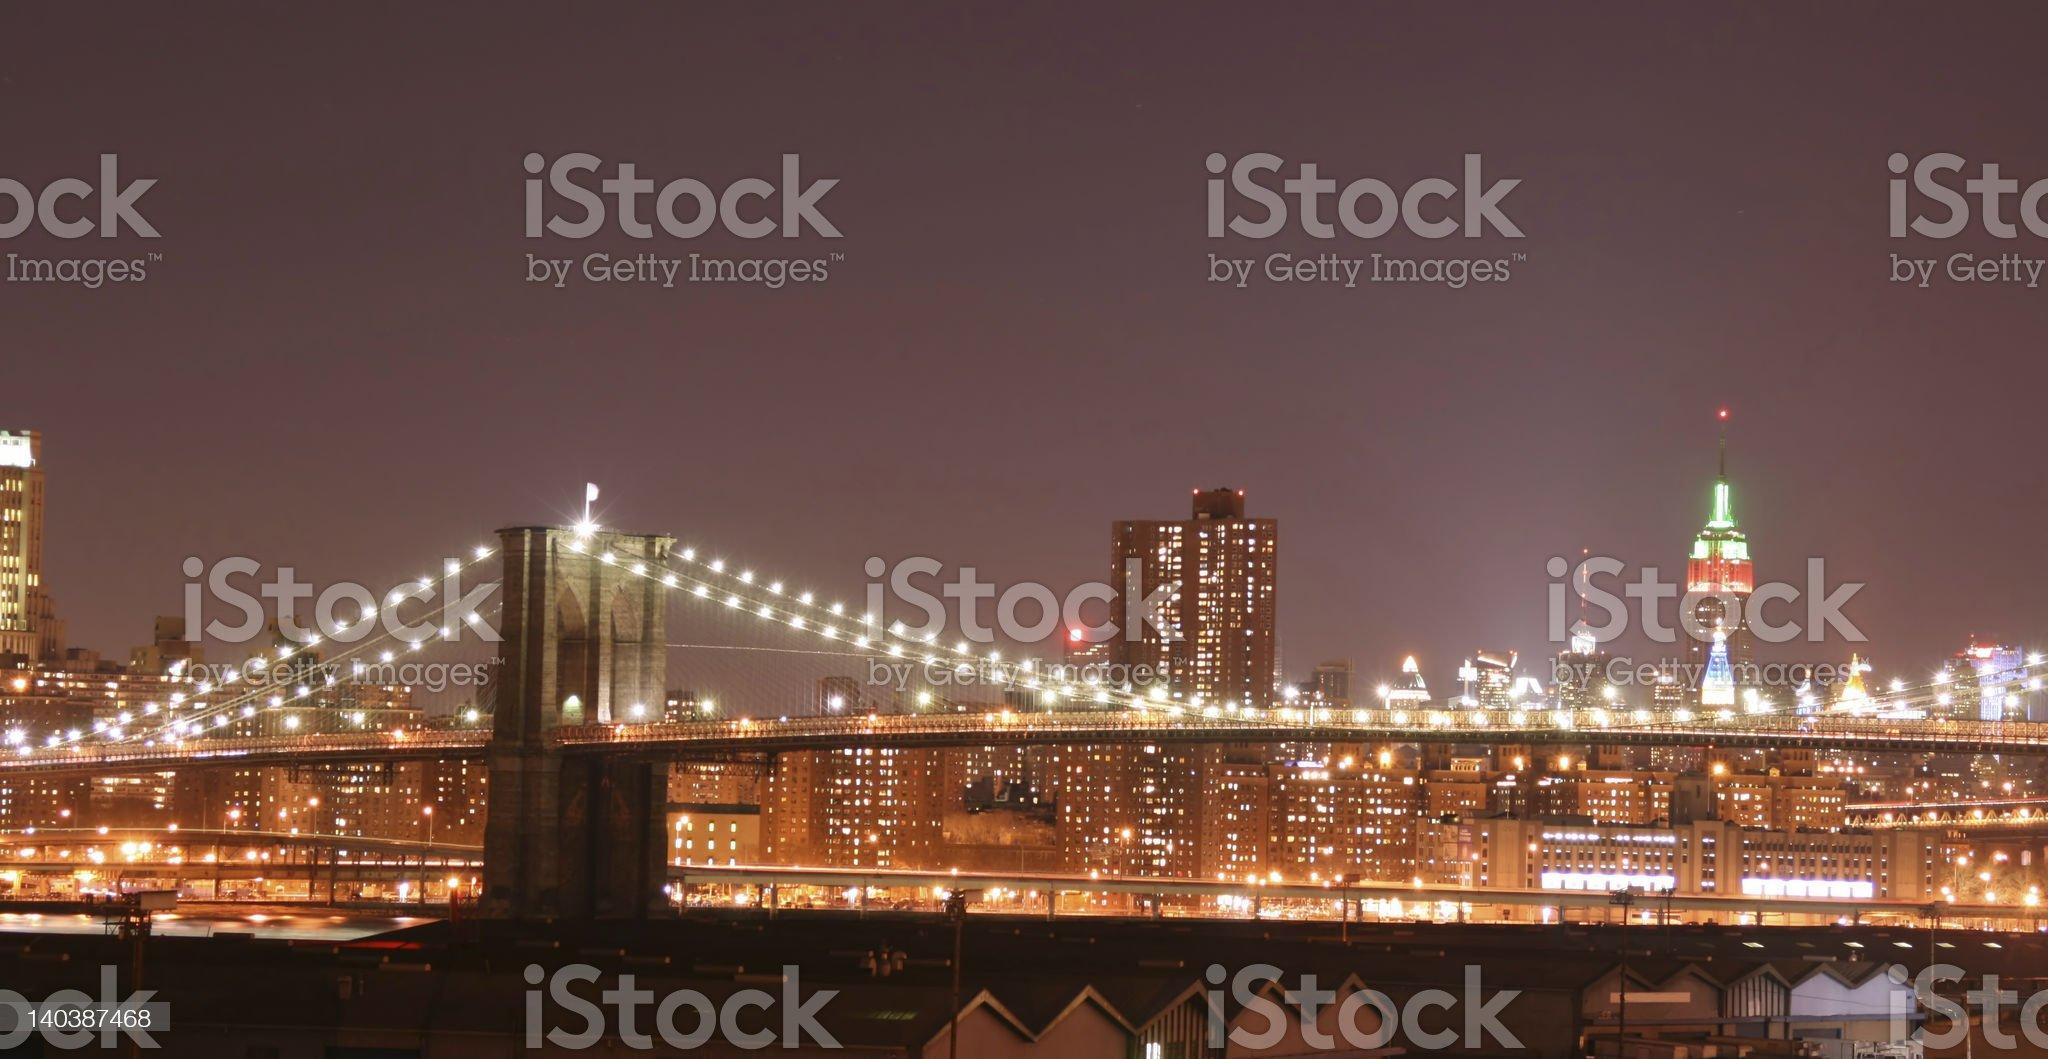 Brooklyn Bridge and Manhattan skyline At Night royalty-free stock photo